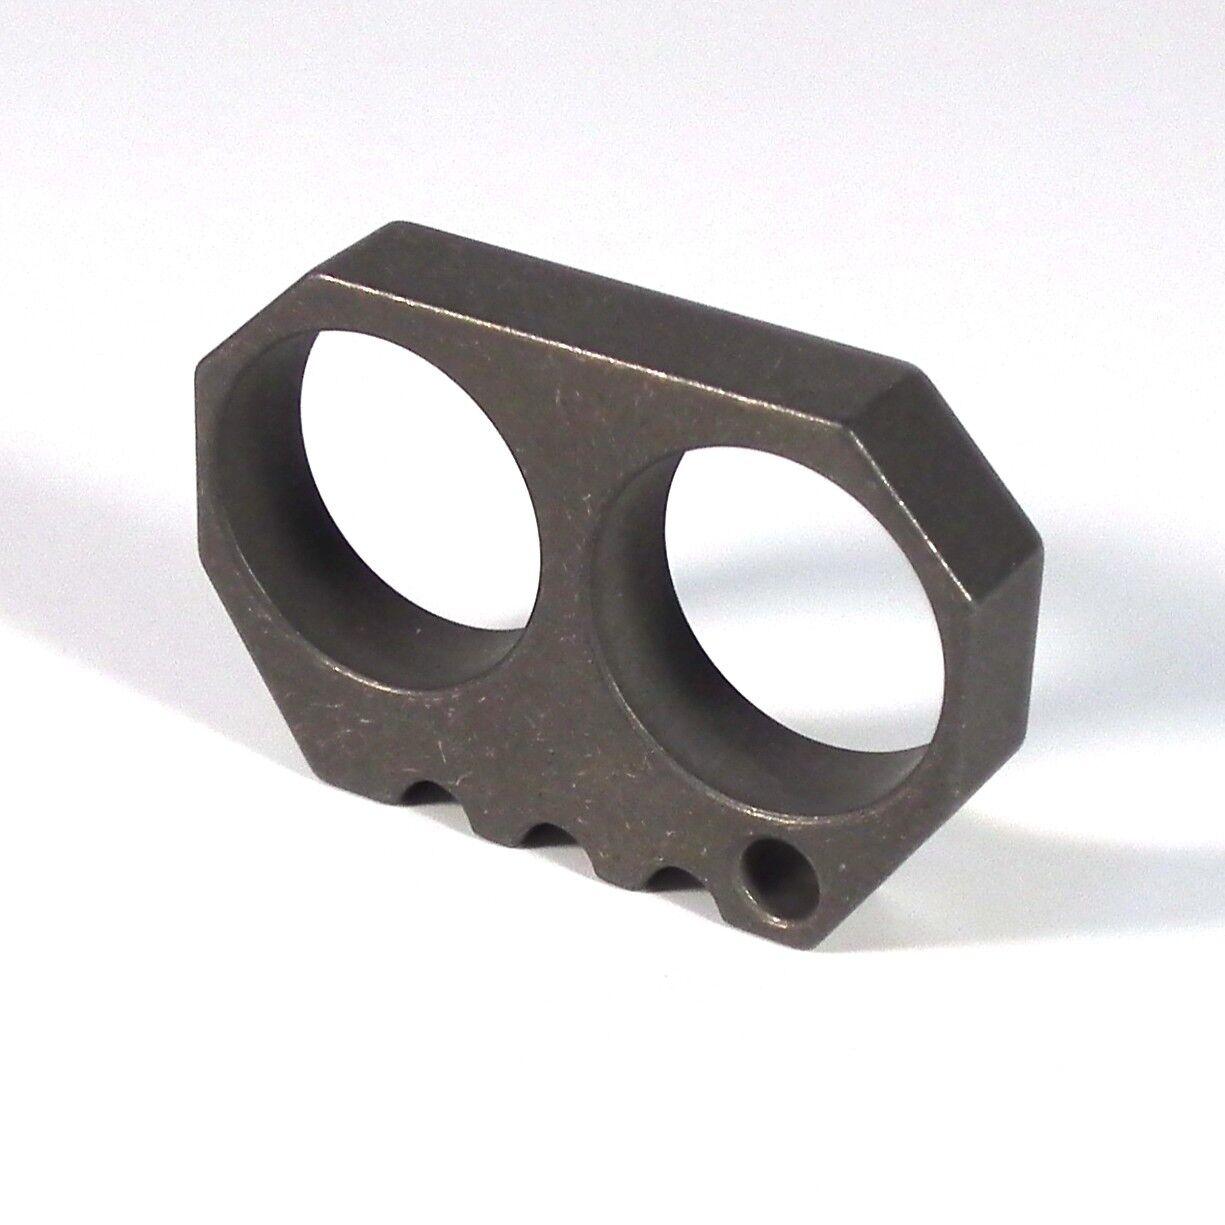 Titanium EDC MULTI TOOL SECURITY SURVIVAL knukle dusters  FINGER OUTDOOR BIKE  large discount